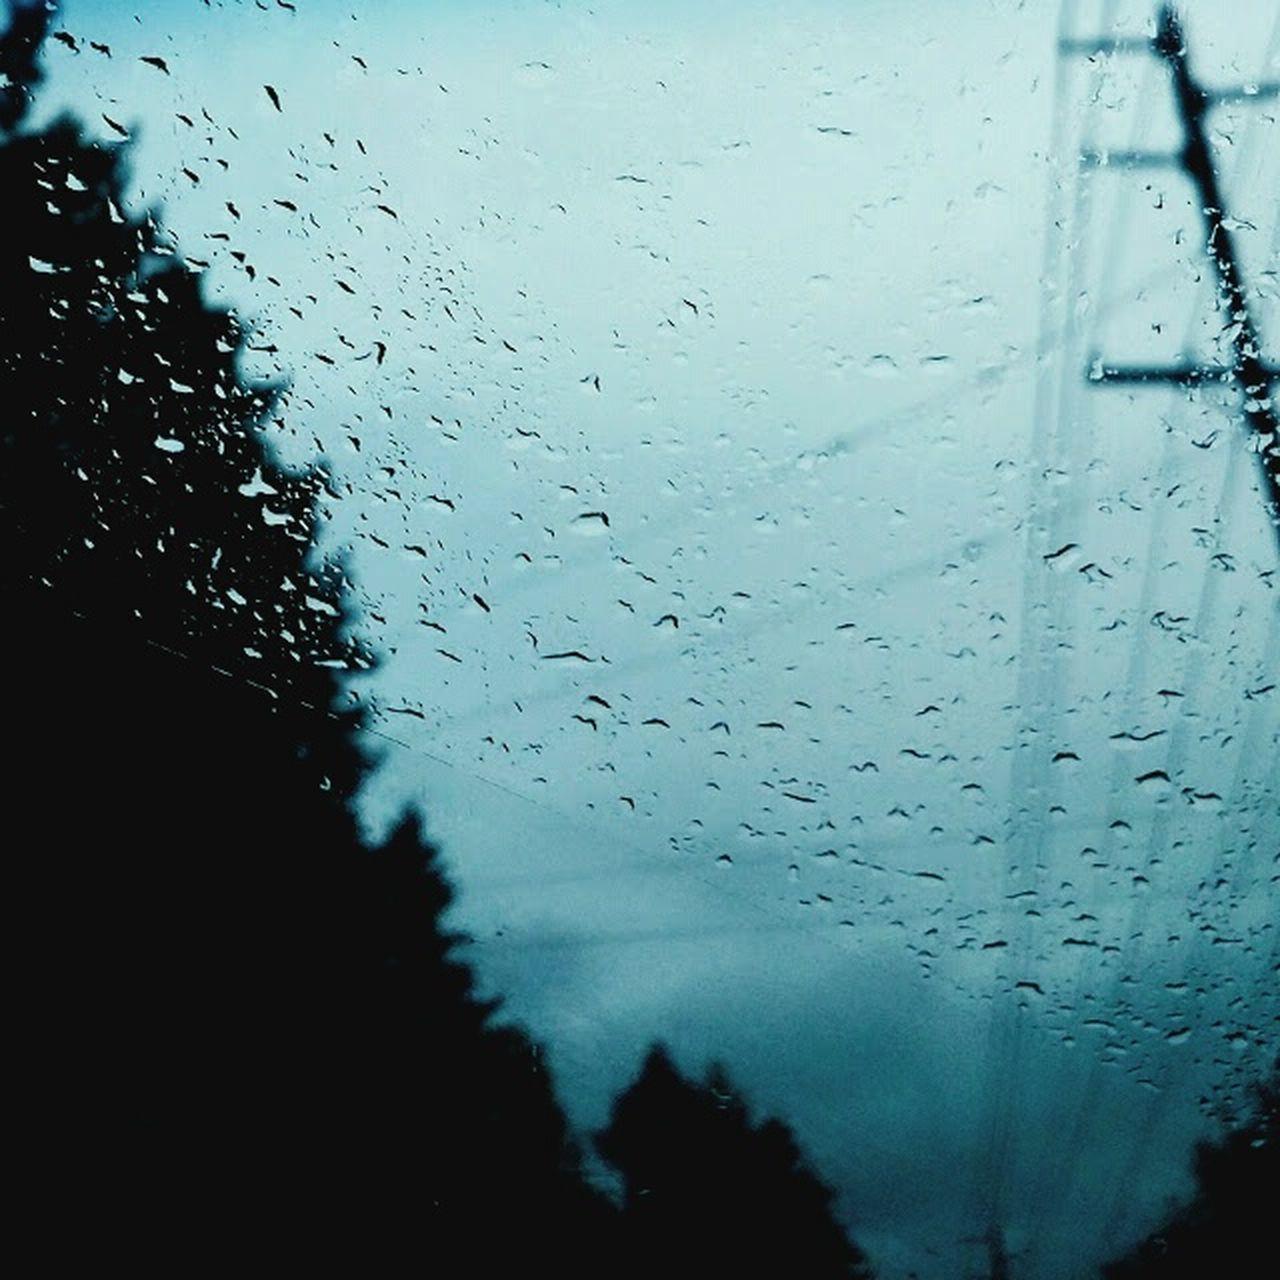 Rain Landlines Windshield Onadrive